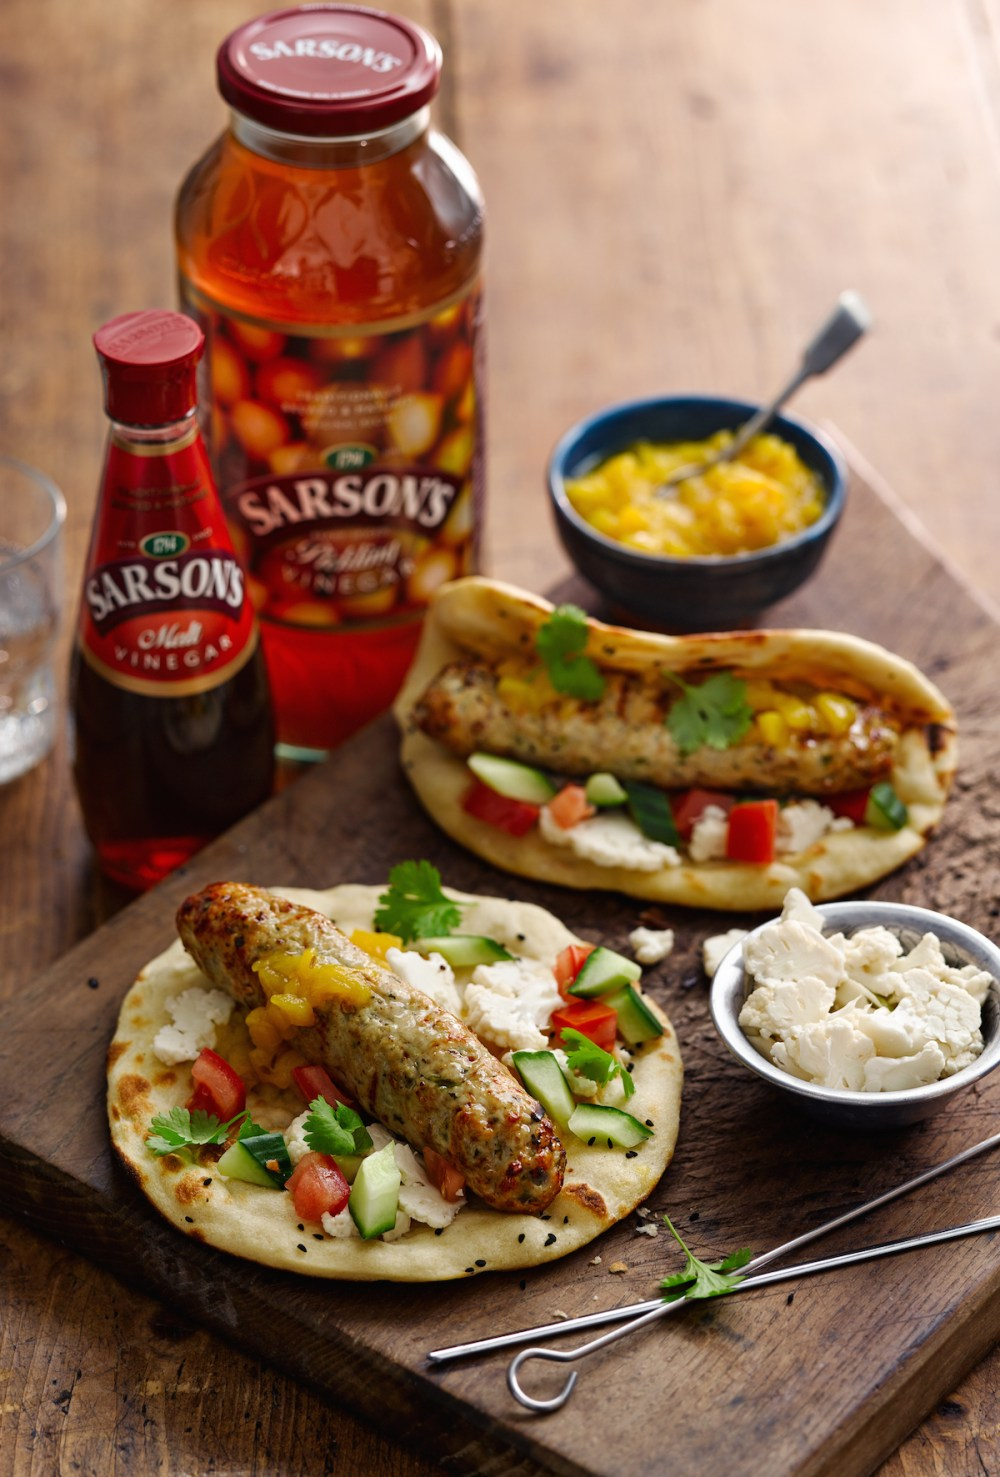 Chicken Seekh Kebab with Malted Mango Chutney